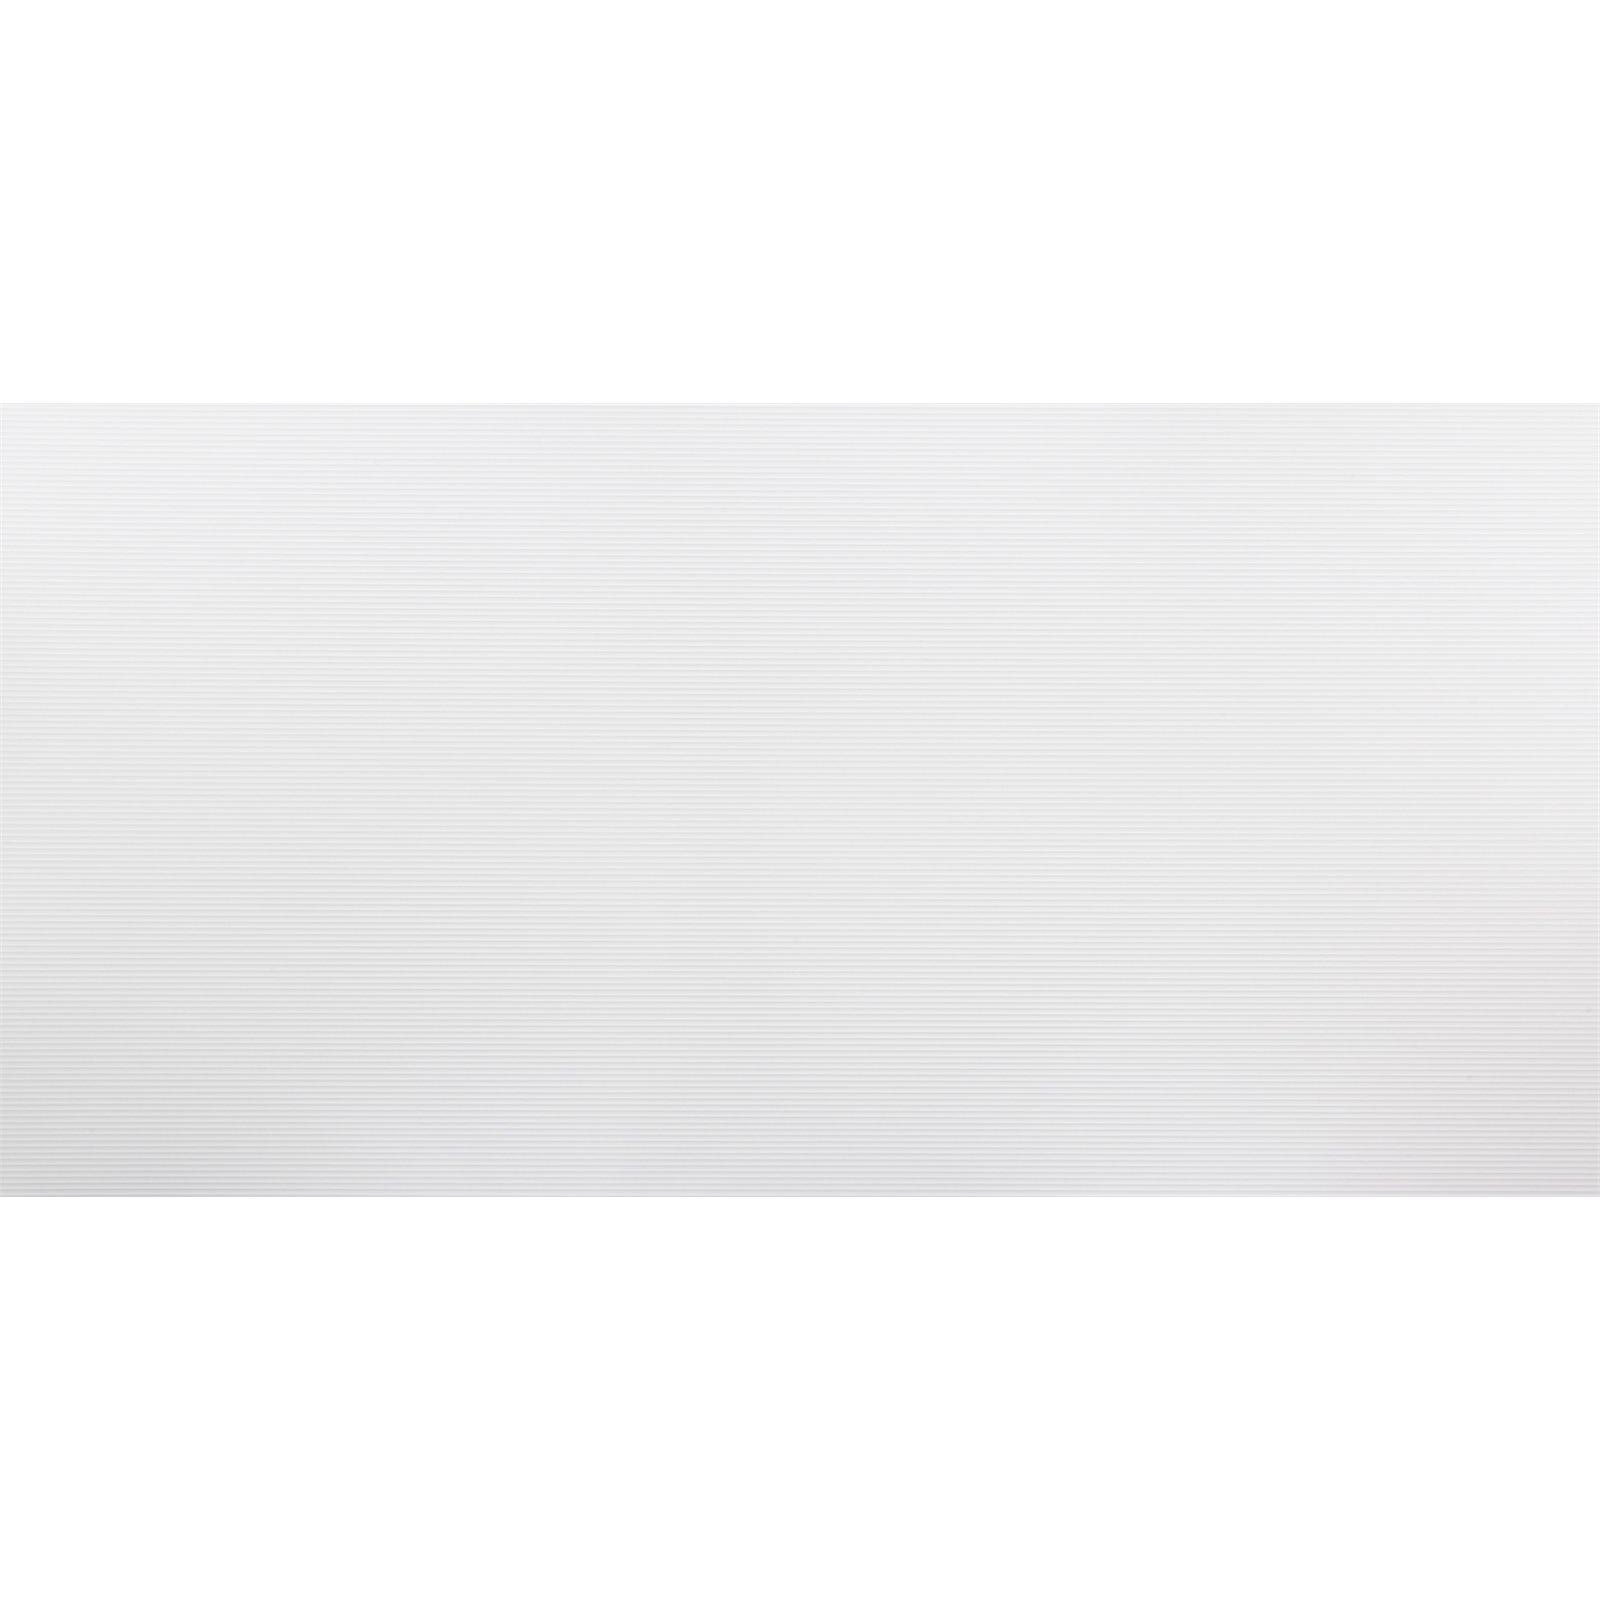 Seratone 2400 x 1200 x 4.5mm Polar White Aqua Ripple Tile